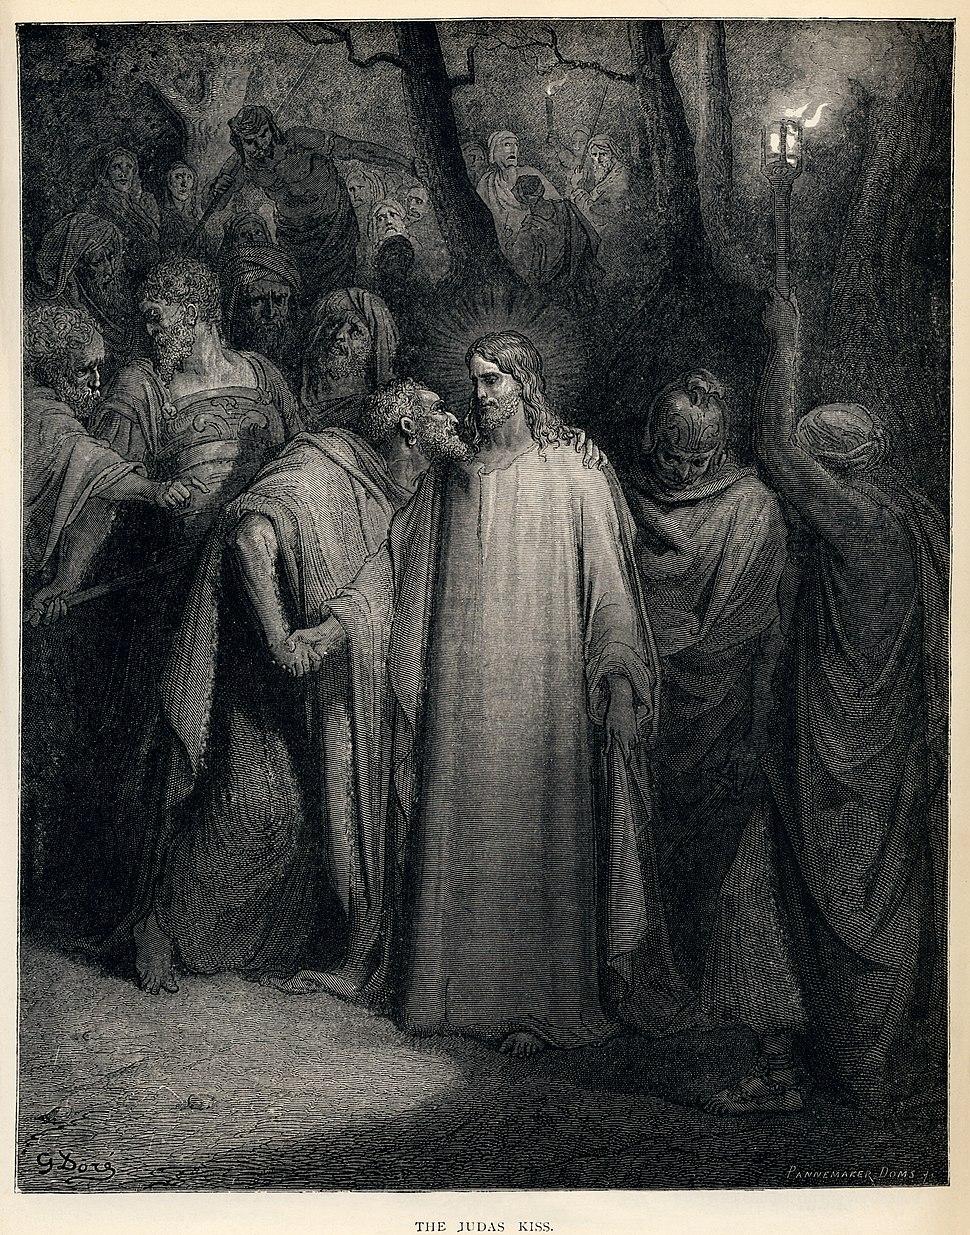 Gustave Doré - The Holy Bible - Plate CXLI, The Judas Kiss